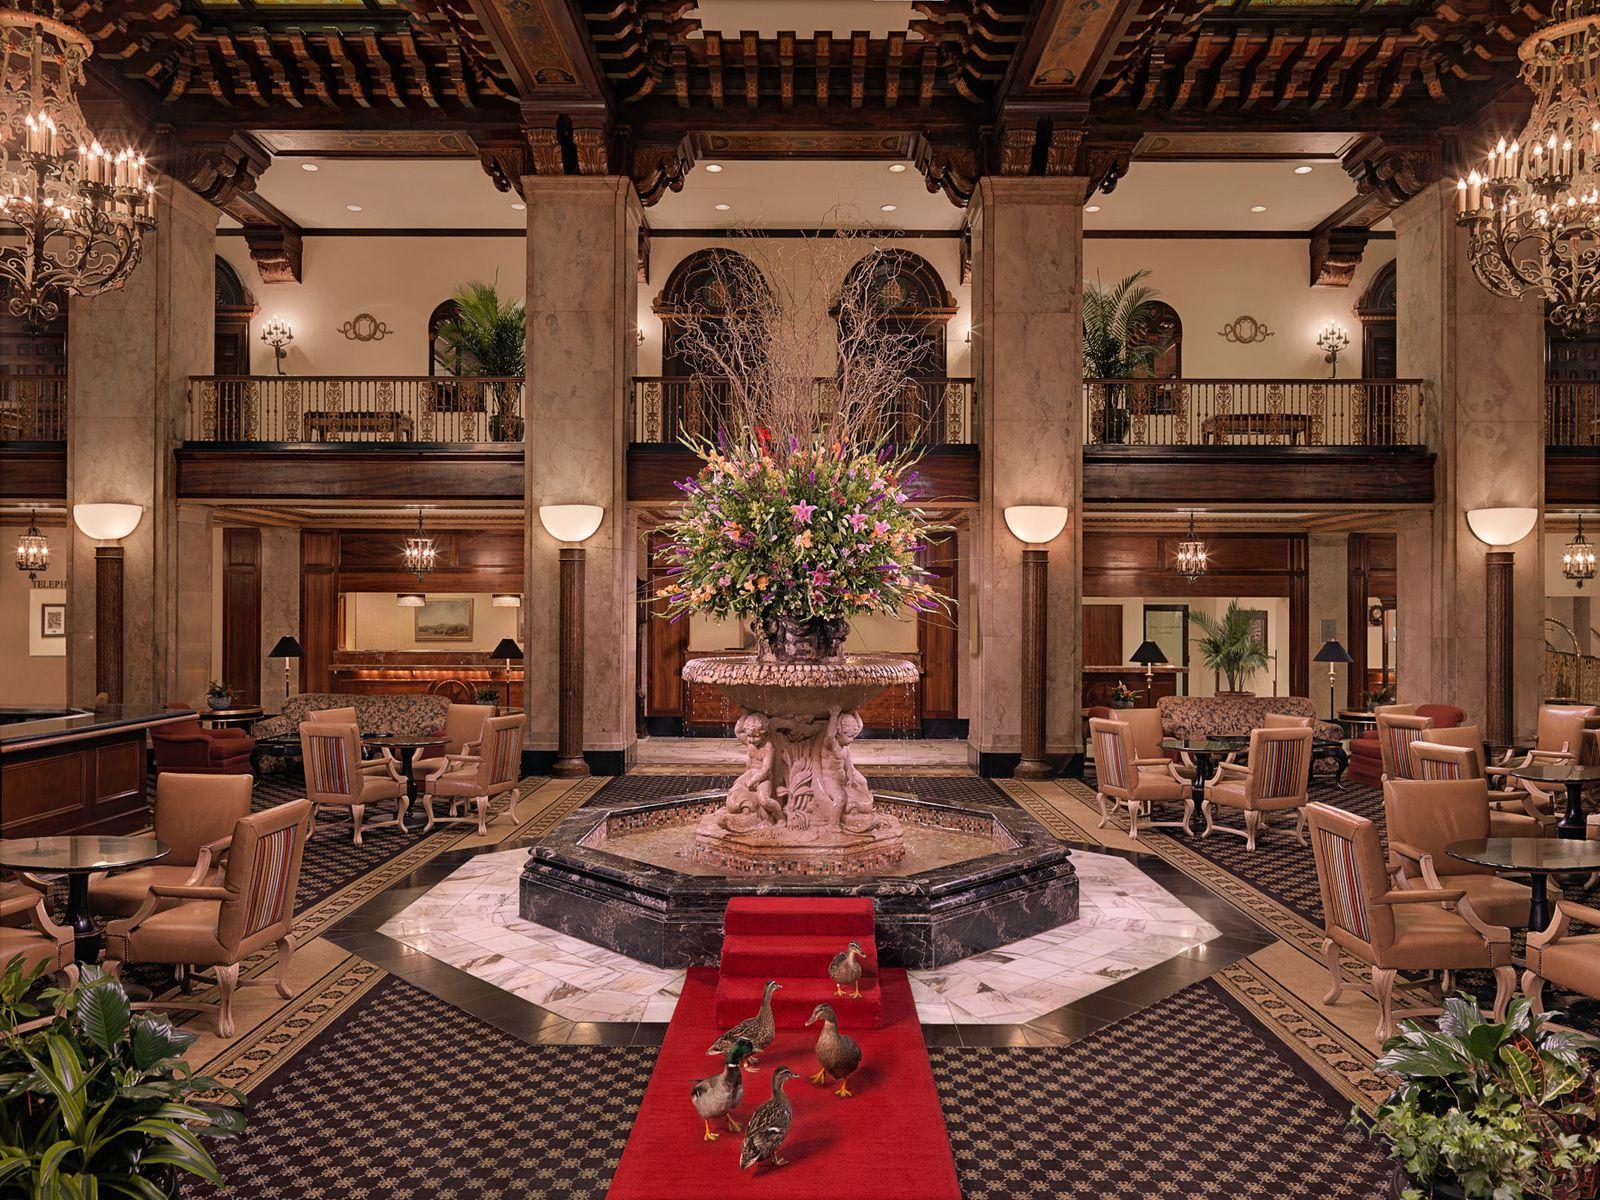 Unusual Unique Vacation Destinations Peabody Hotel Memphis Tennessee This Luxury